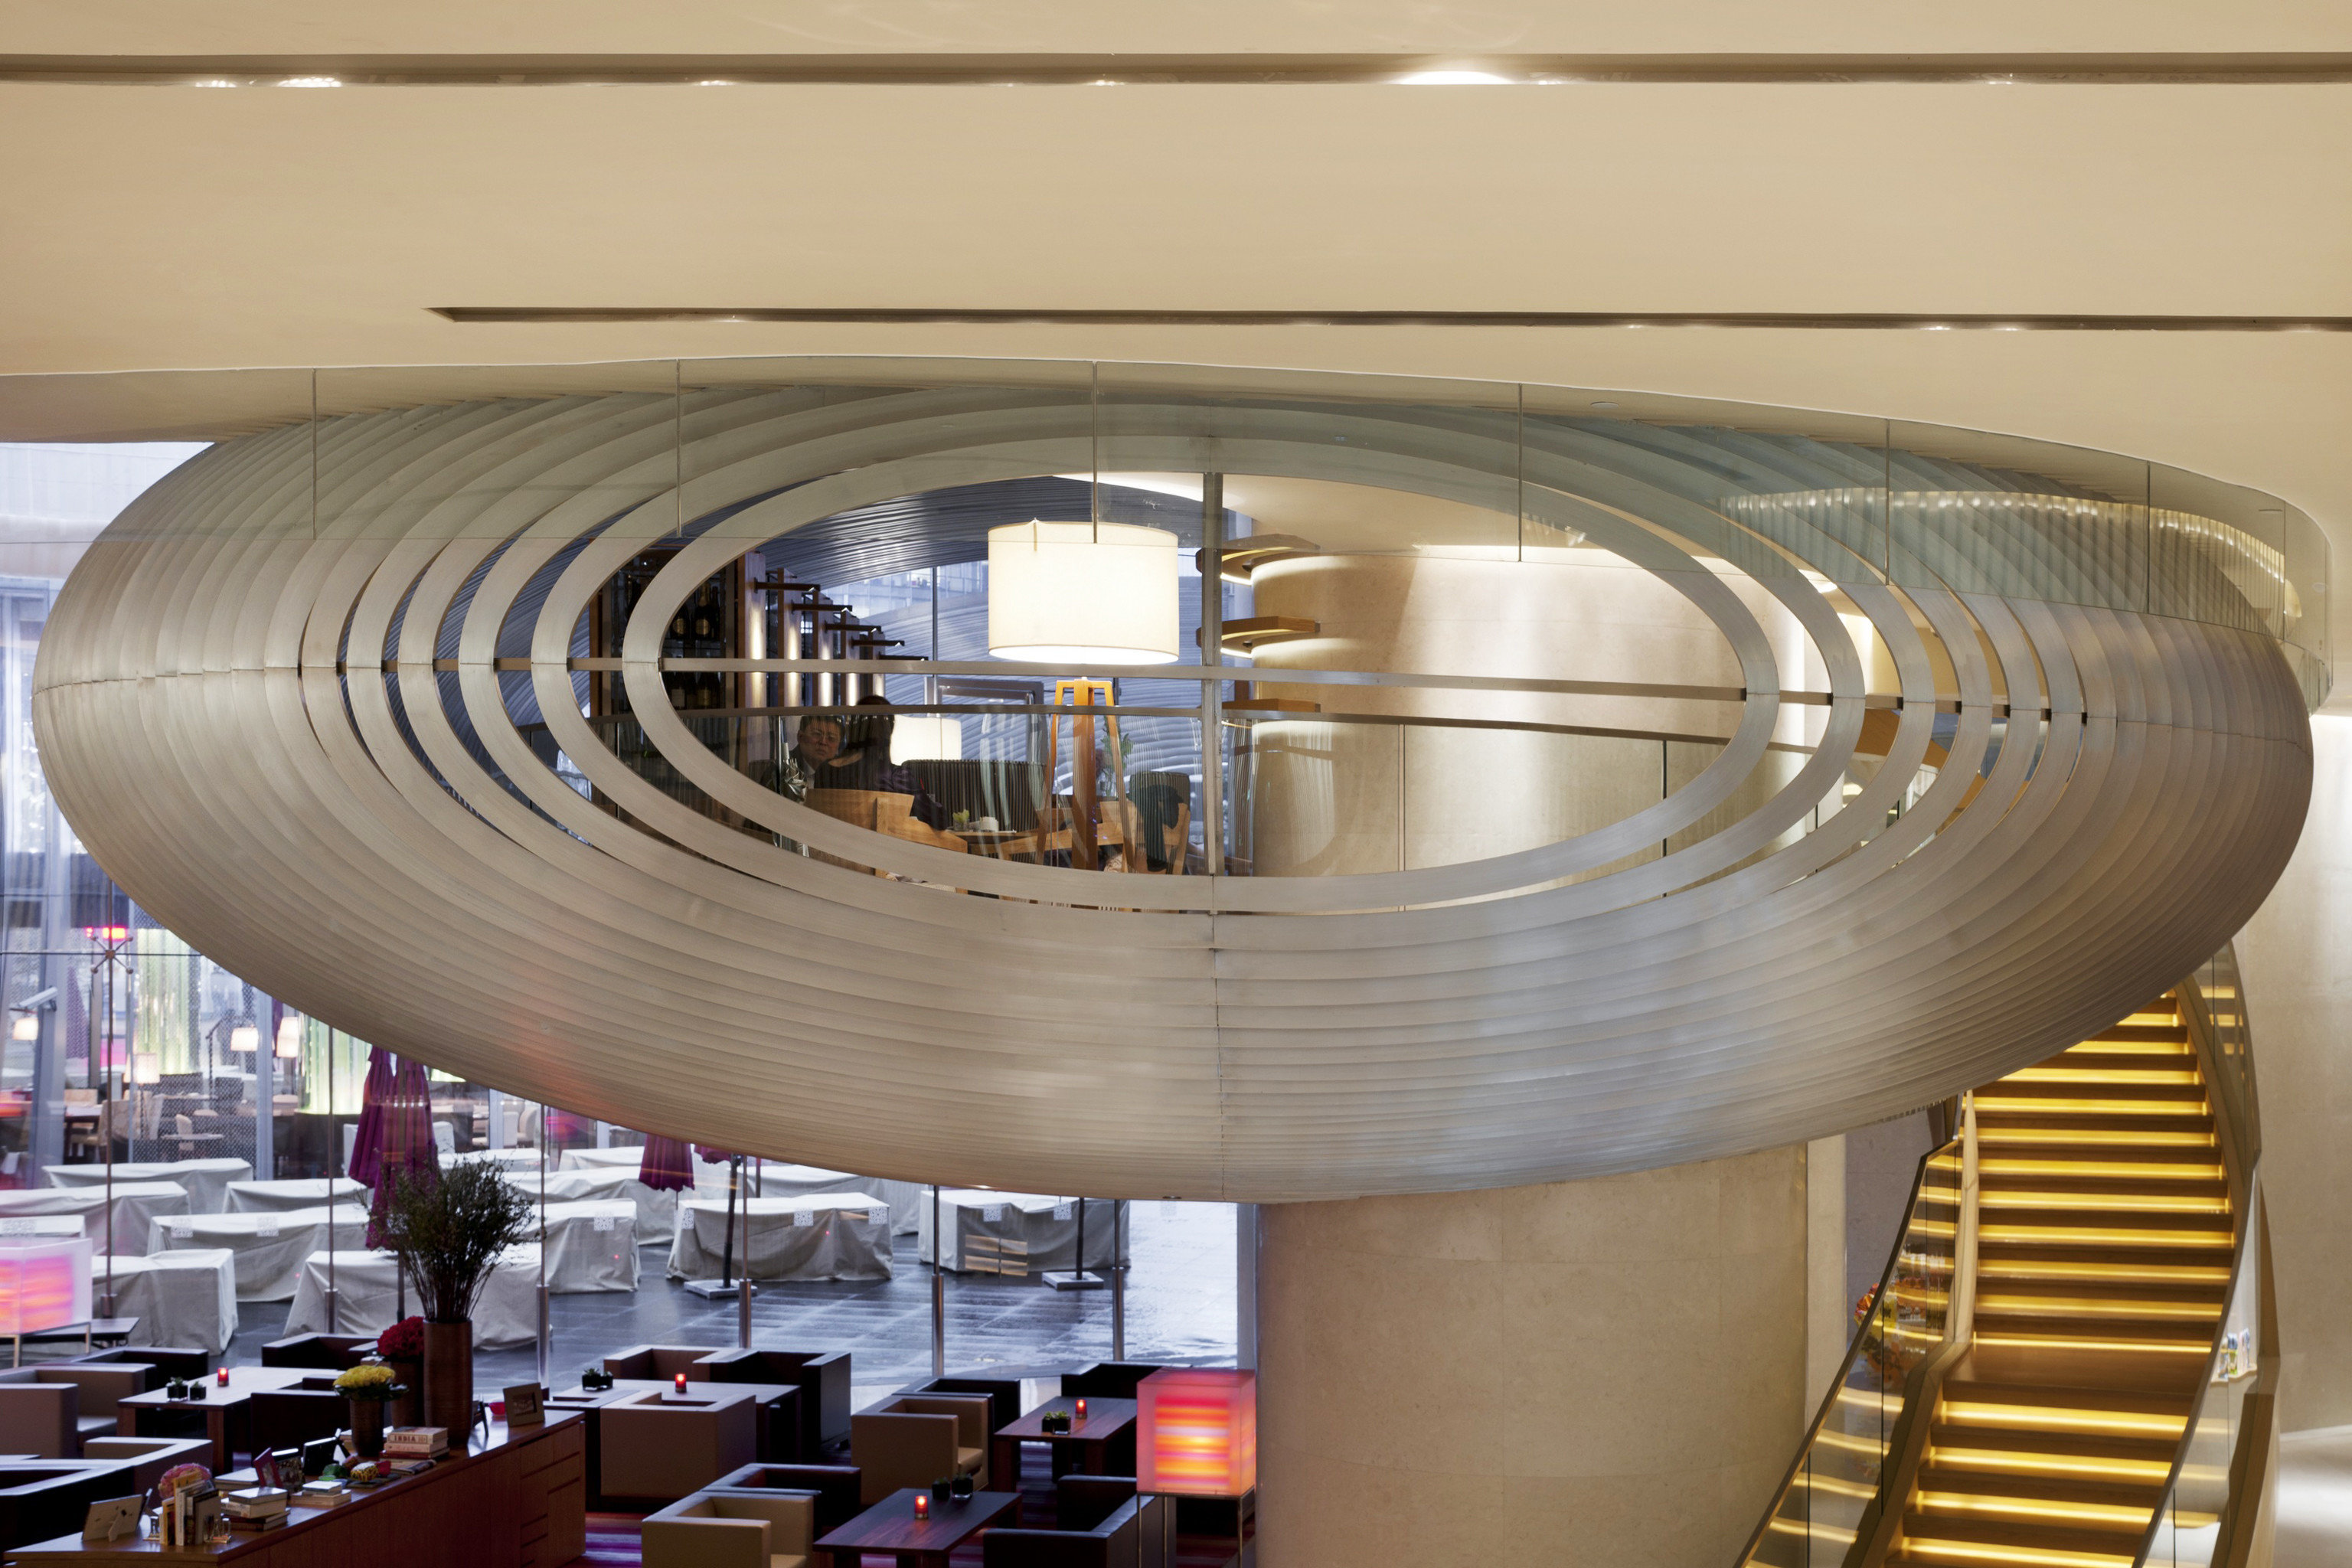 Bar Dining Drink Eat Luxury Modern Architecture daylighting lighting aircraft engine